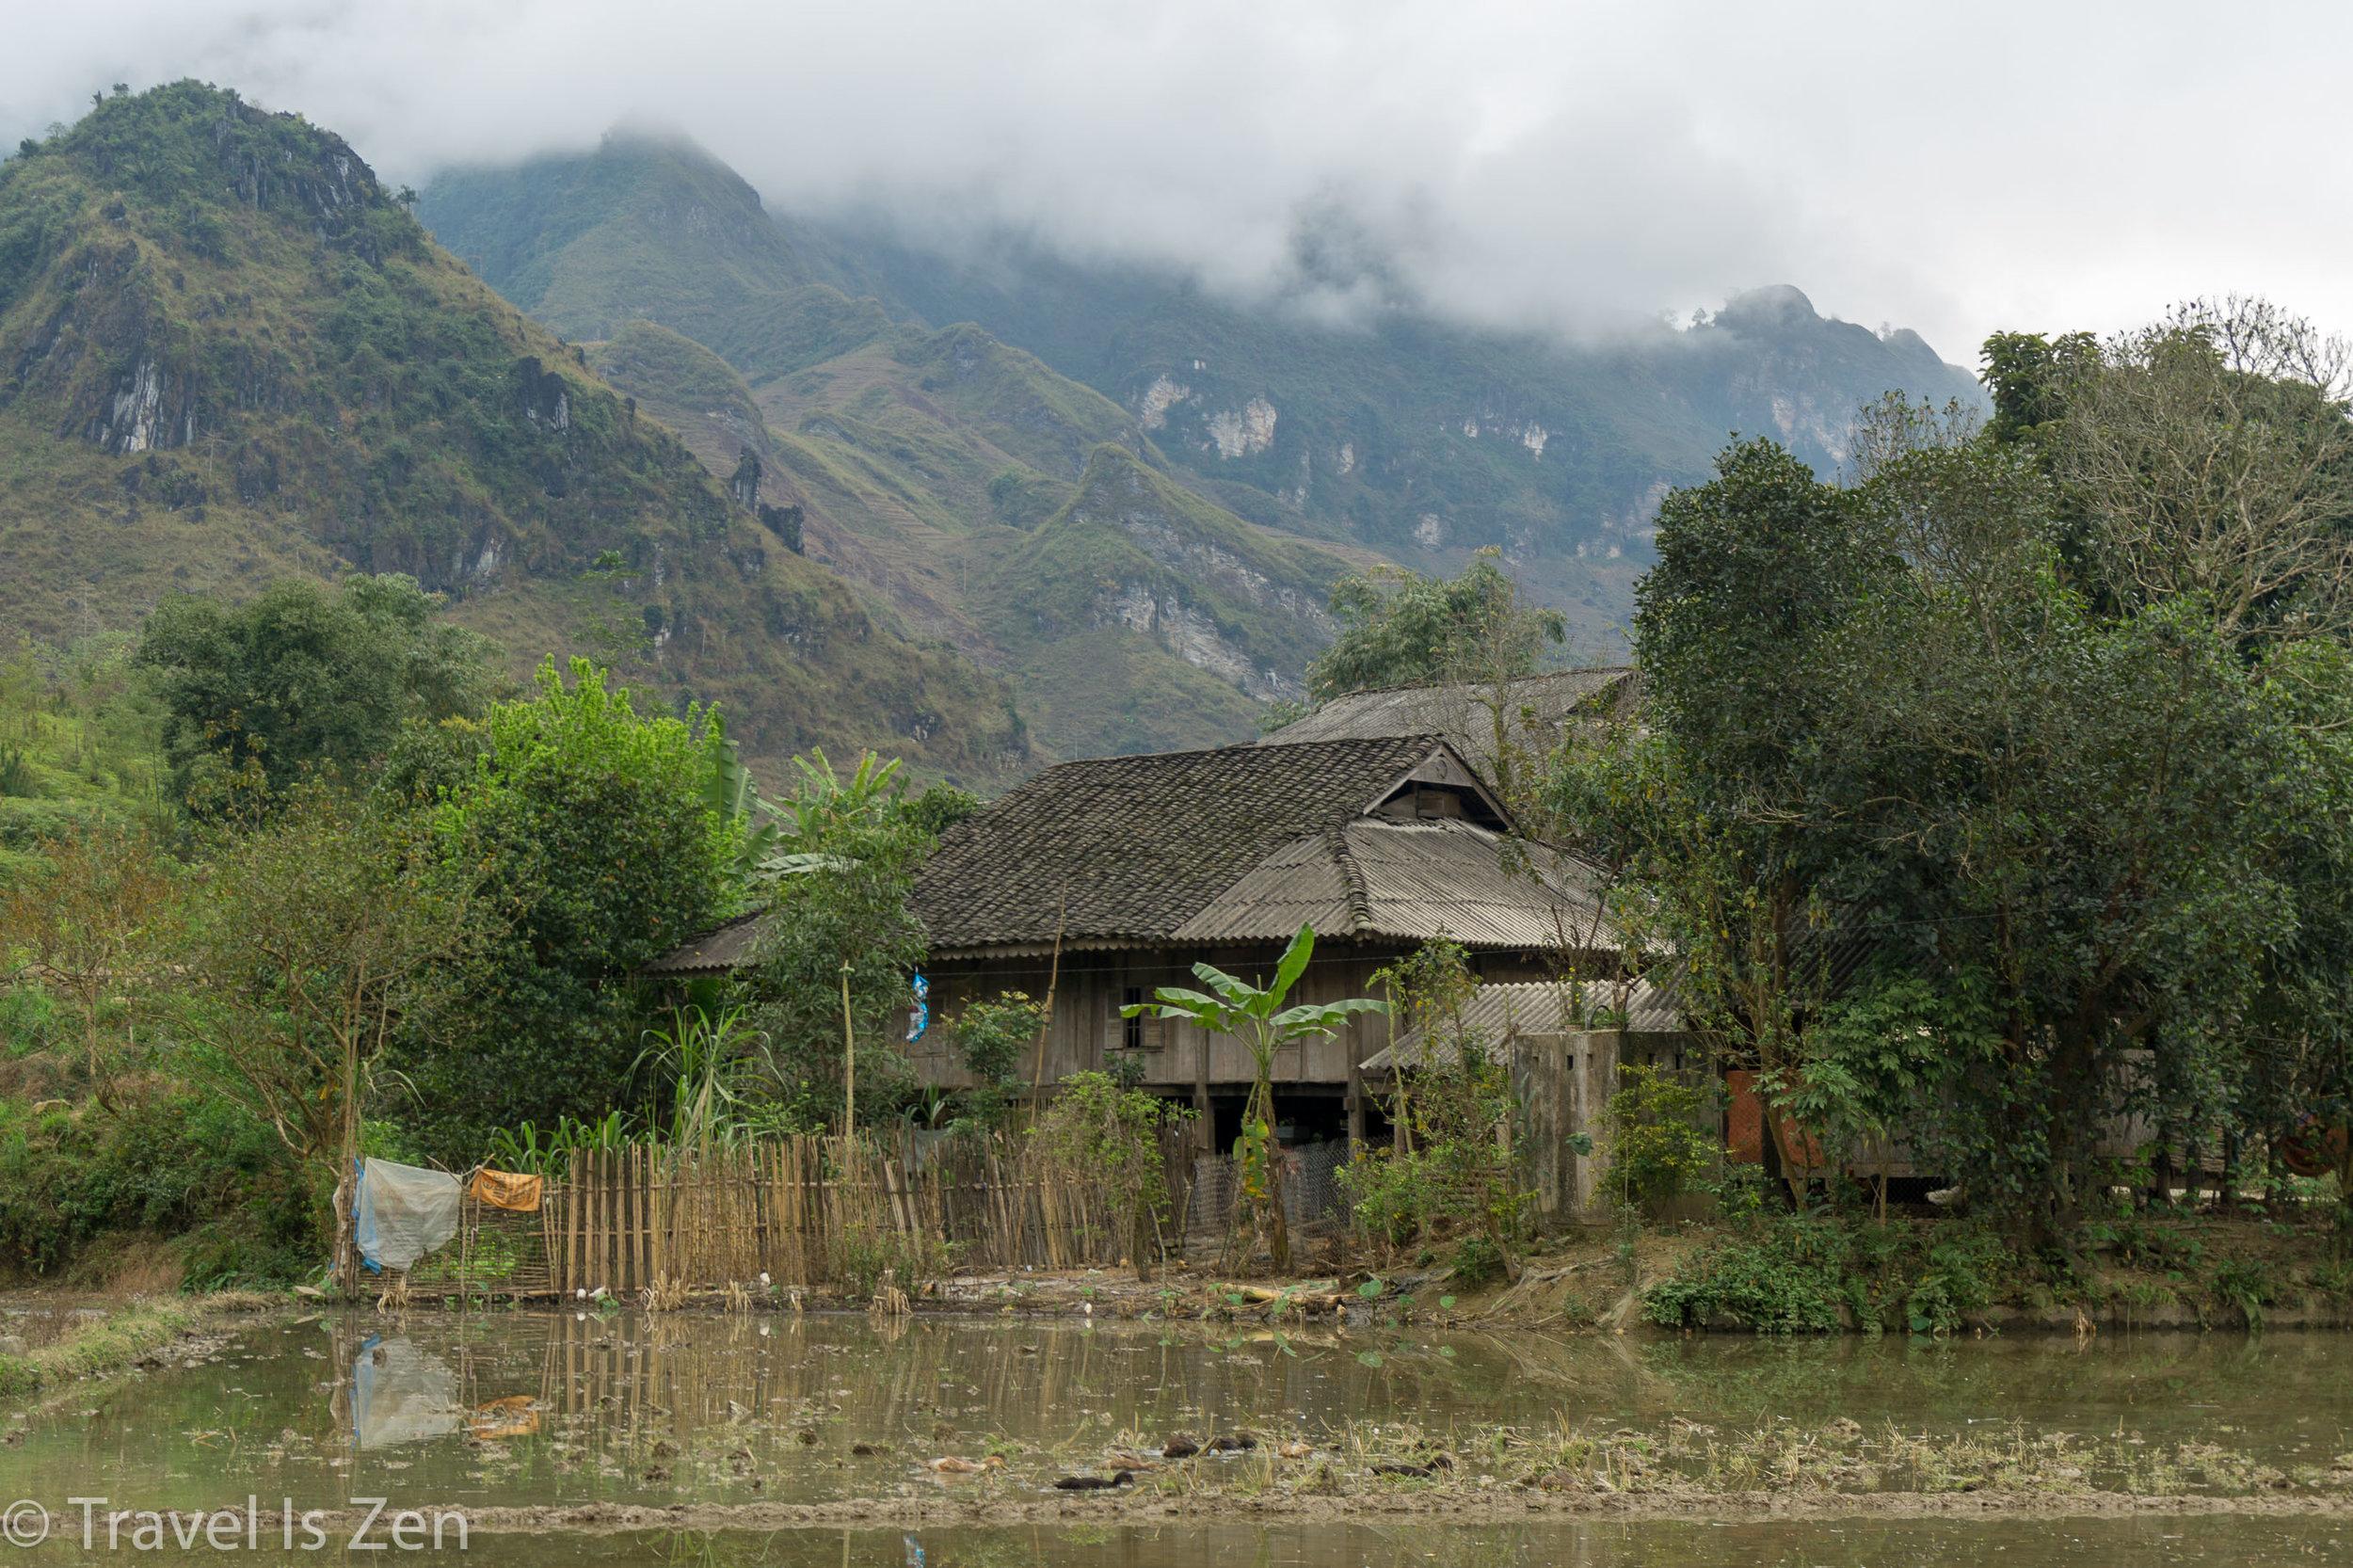 Ha Giang province, Vietnam